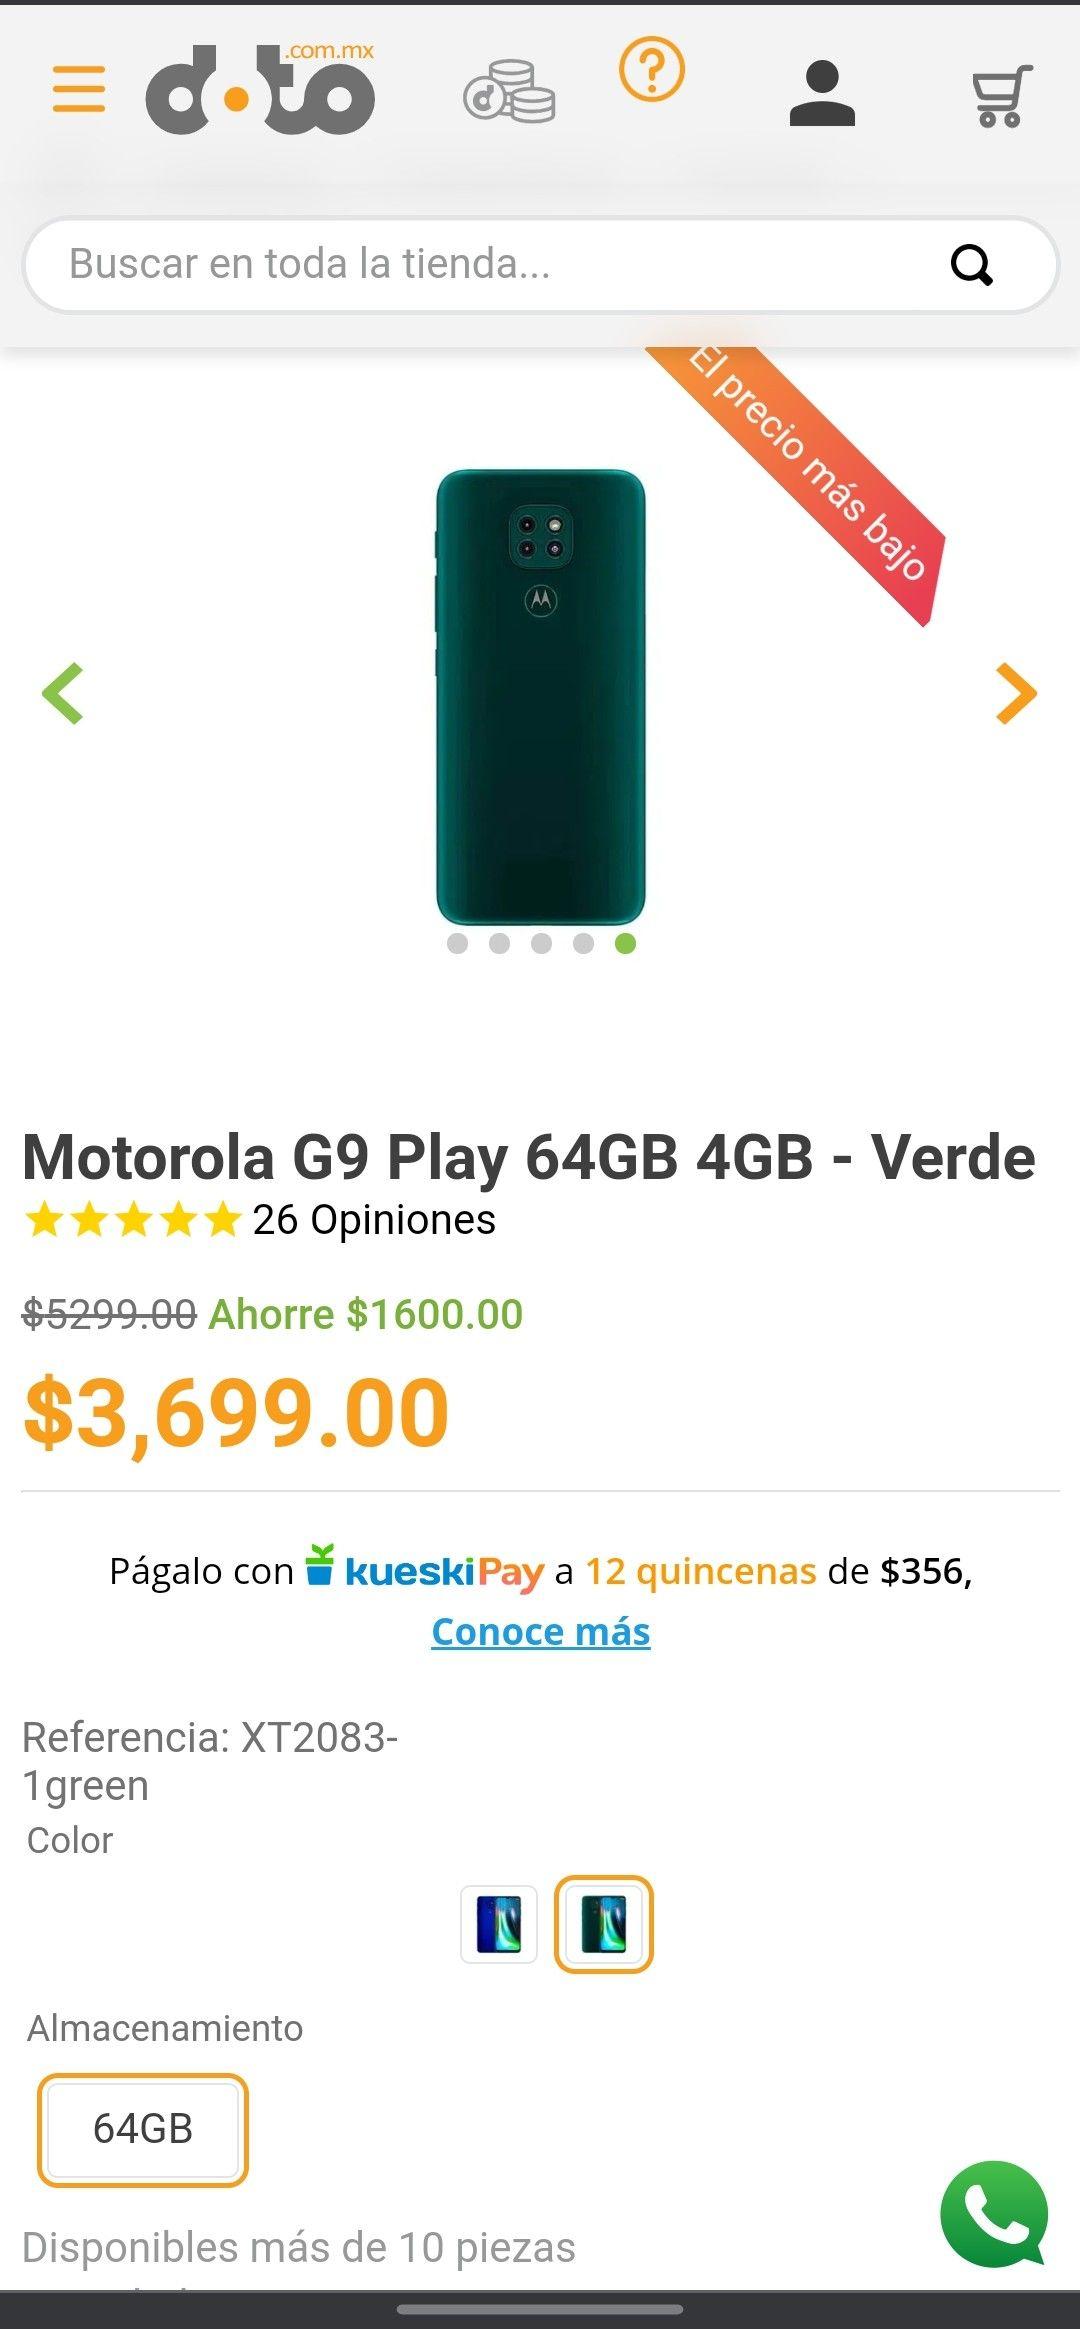 Doto: Moto G9 Play (MP + CITIBANAMEX)